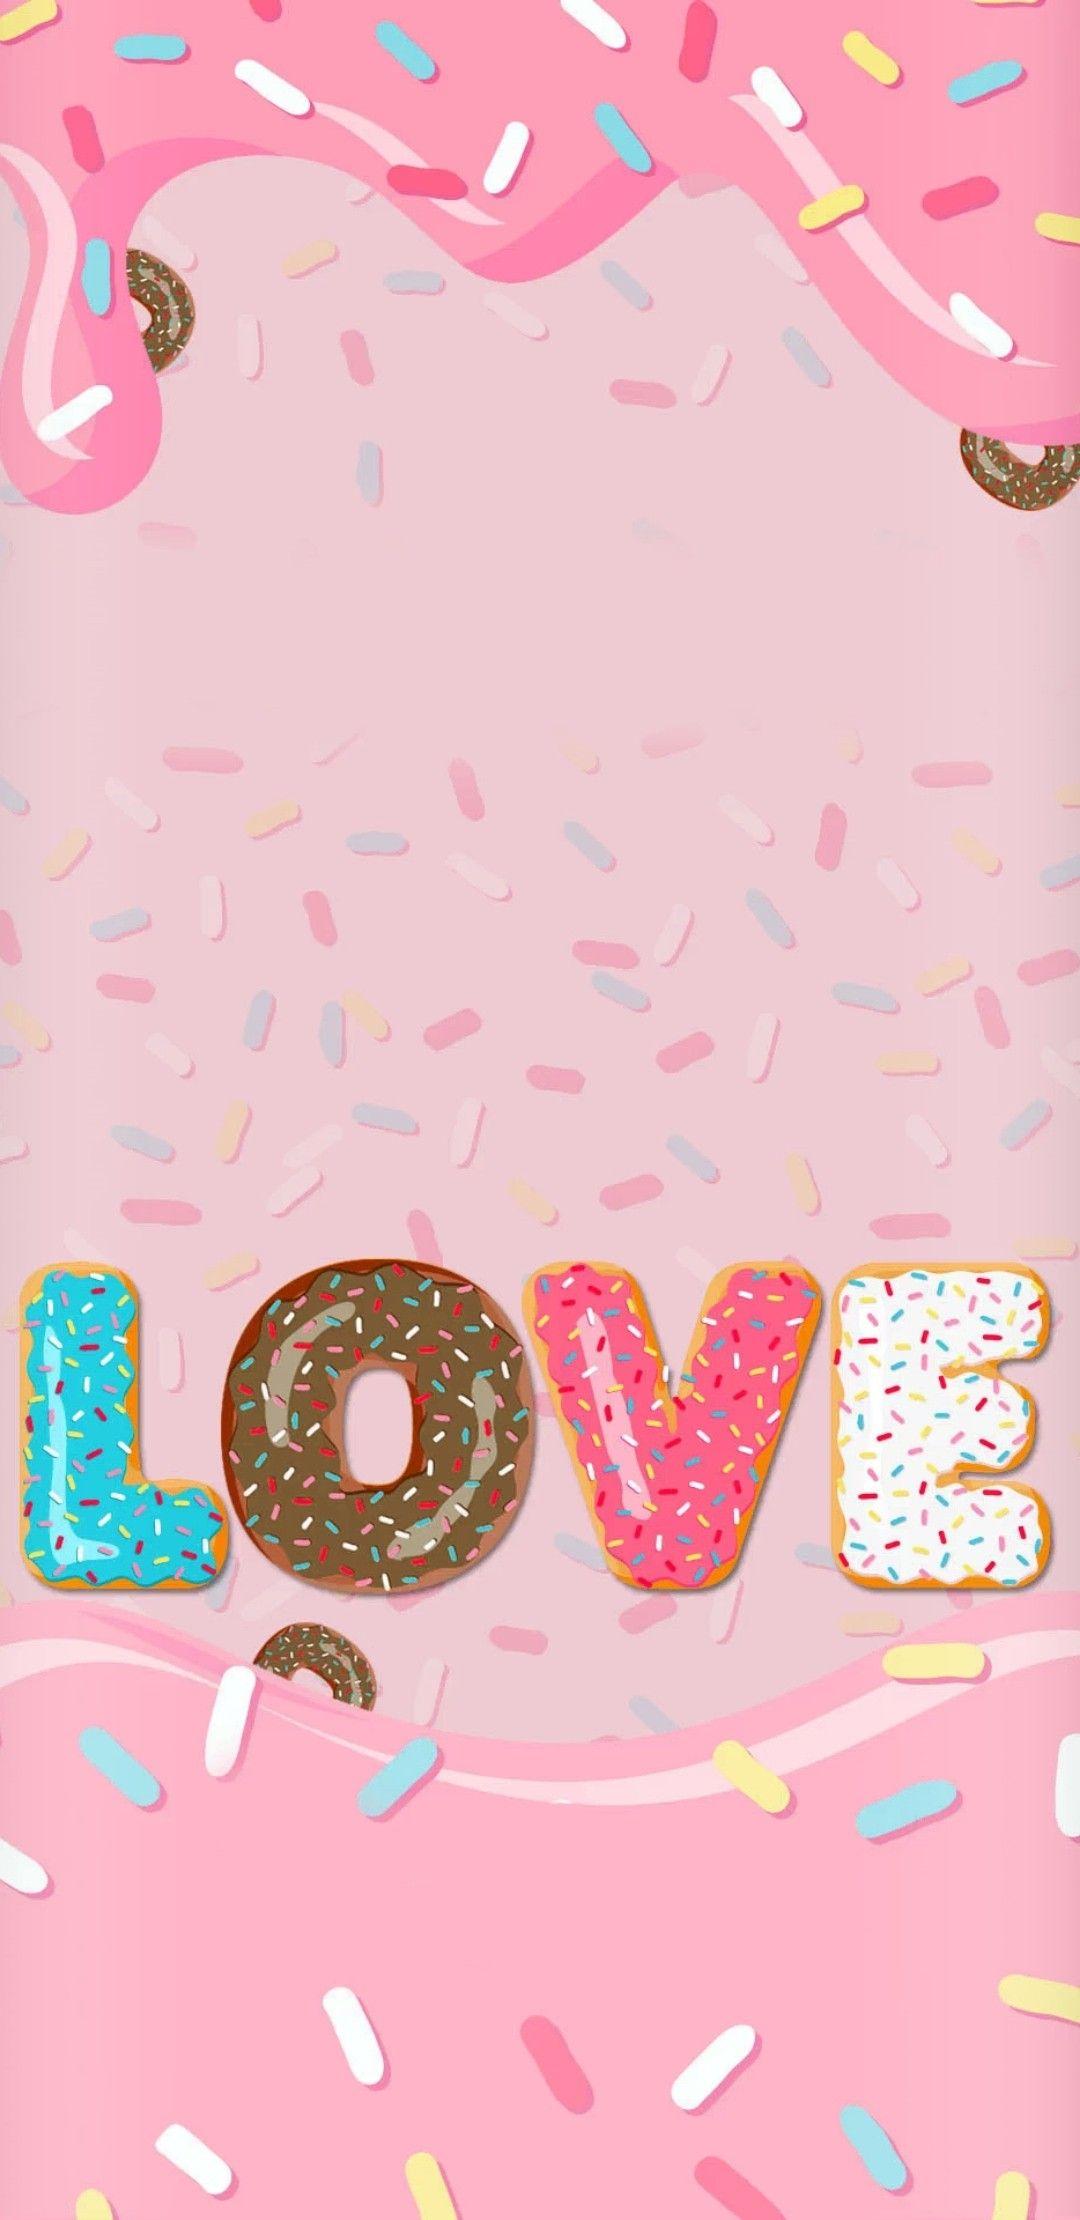 I Love You Valentines Wallpaper Cute Disney Wallpaper Kawaii Wallpaper